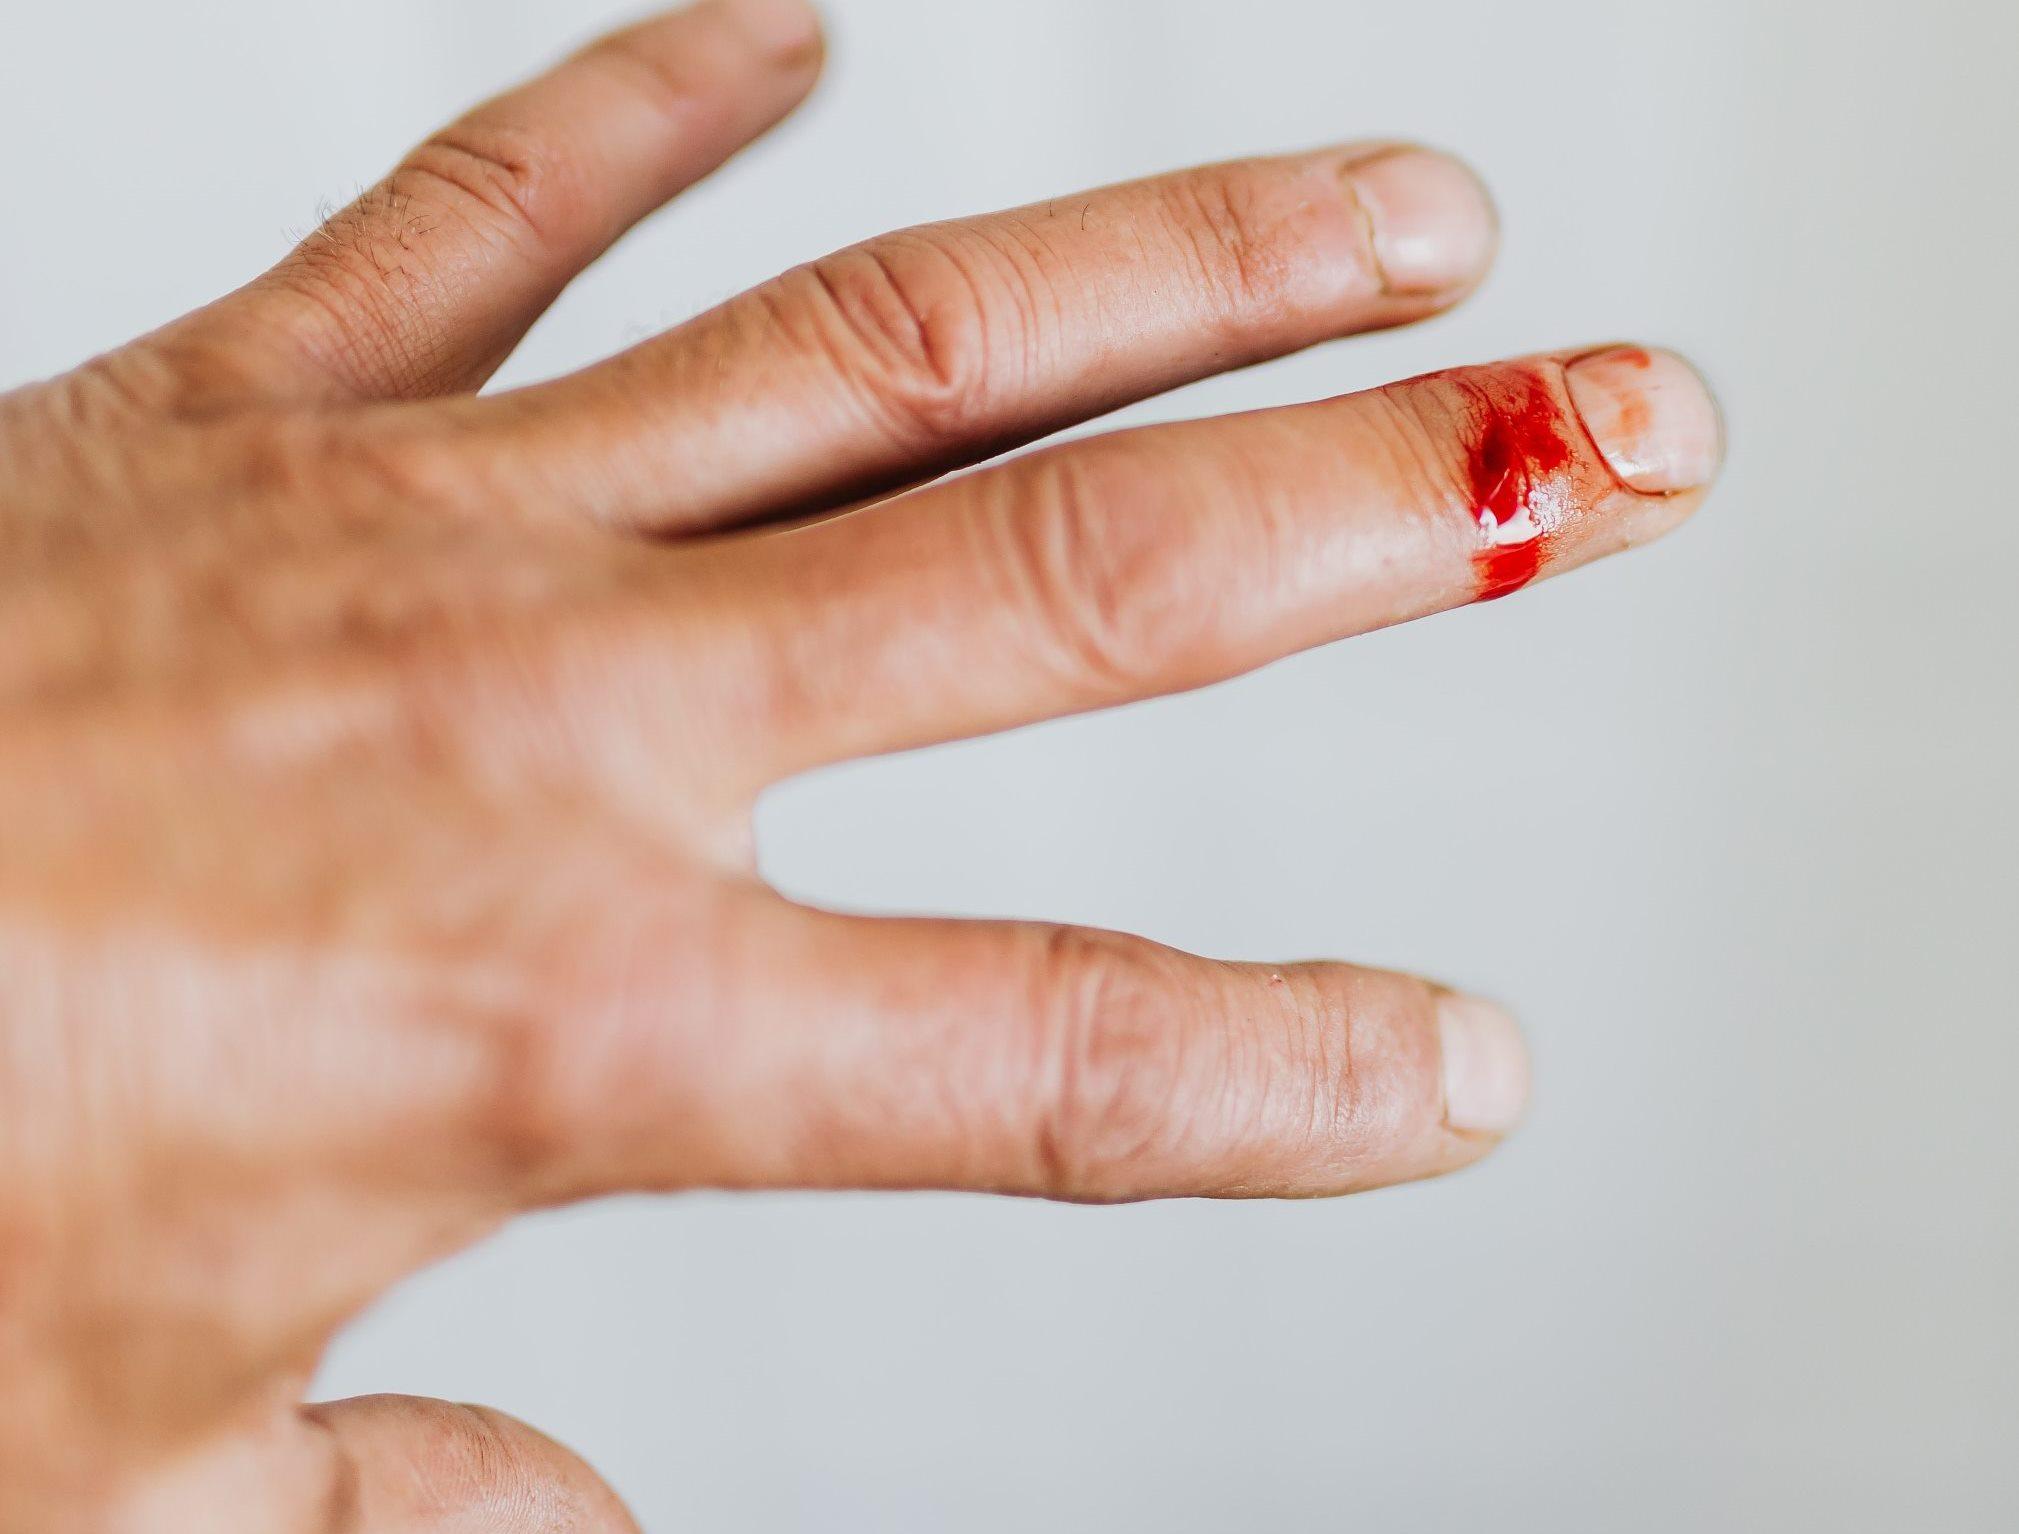 crop-man-hand-with-cut-finger-wound-carolina_grabowska_pexels_2.jpg